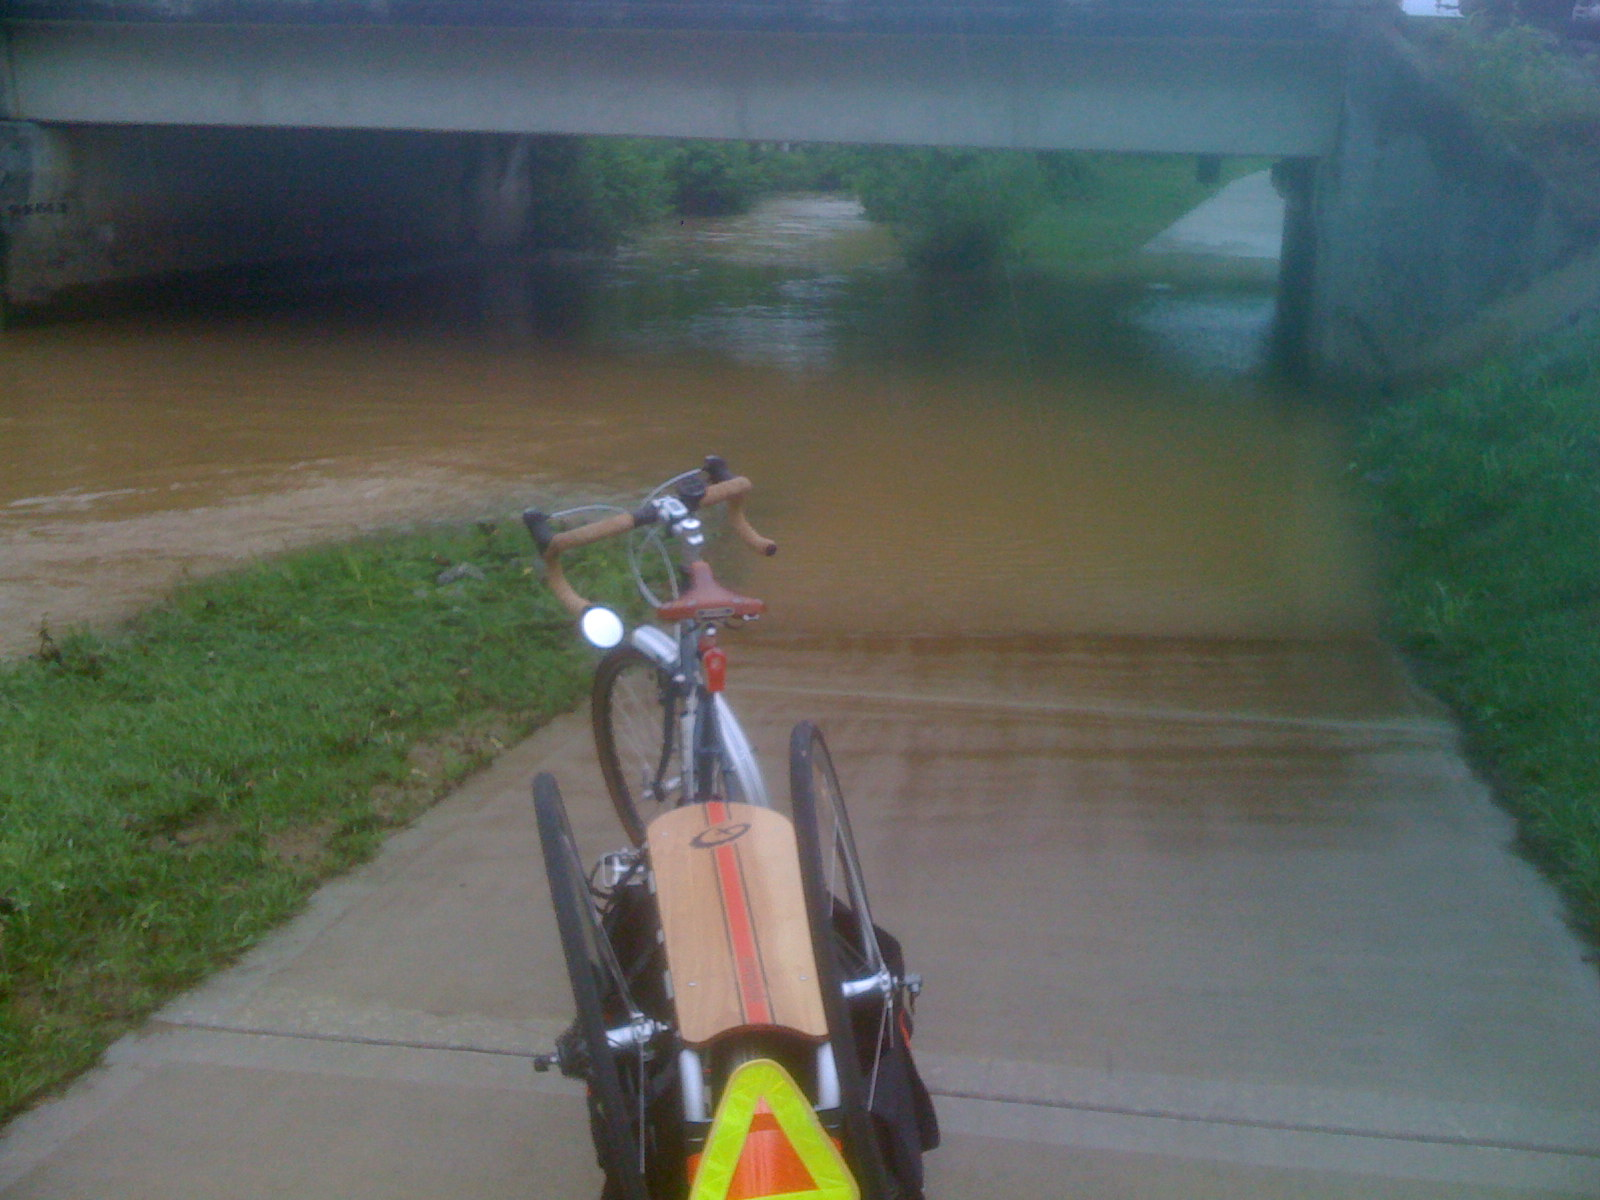 Cleveland, TN, Greenway/Bike Path - after the rain